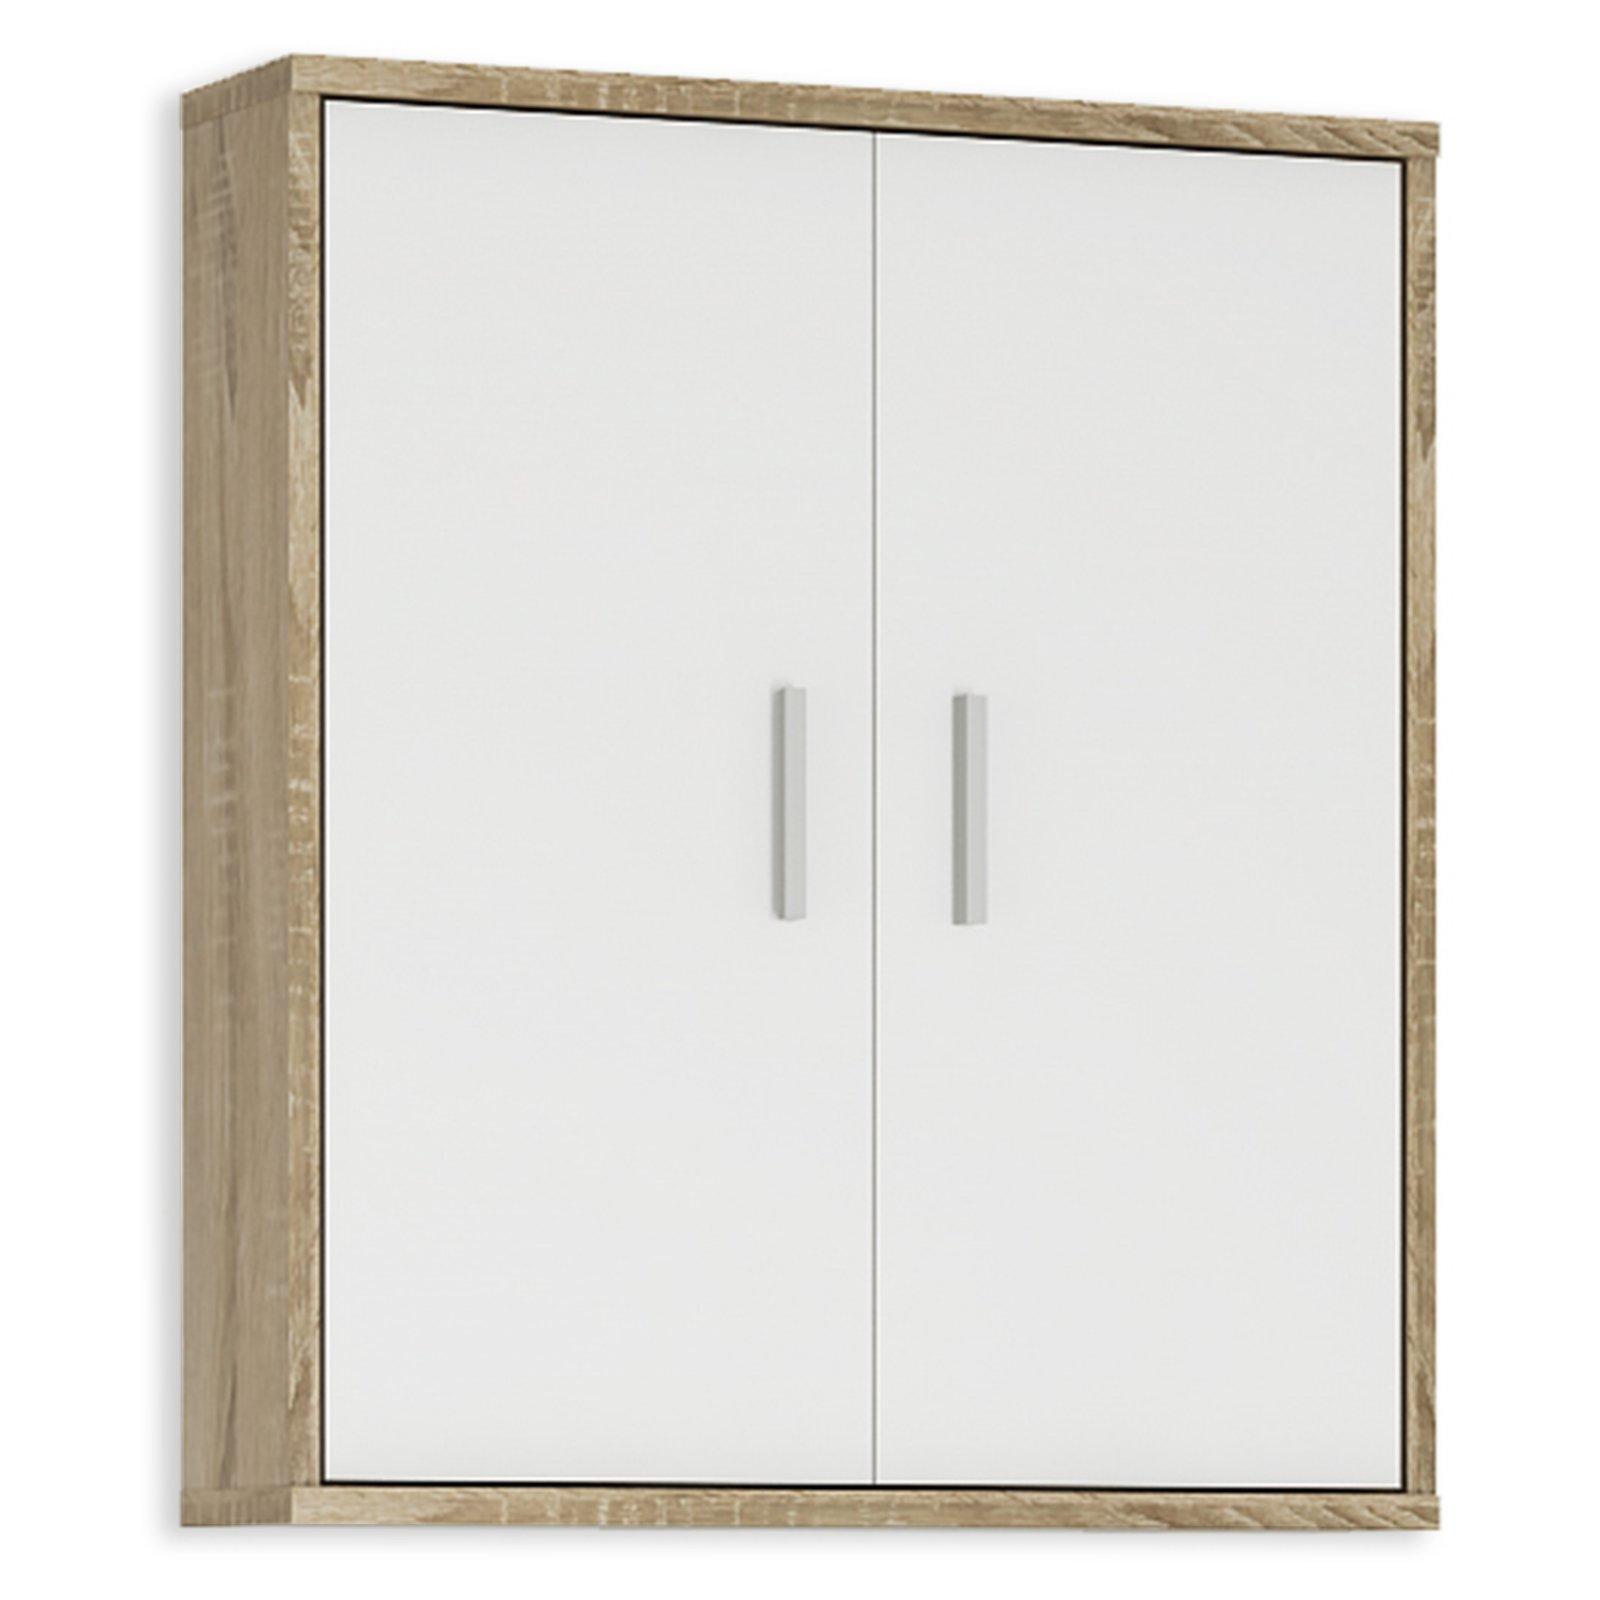 h ngeschrank lilly wei sonoma eiche 61 cm ebay. Black Bedroom Furniture Sets. Home Design Ideas